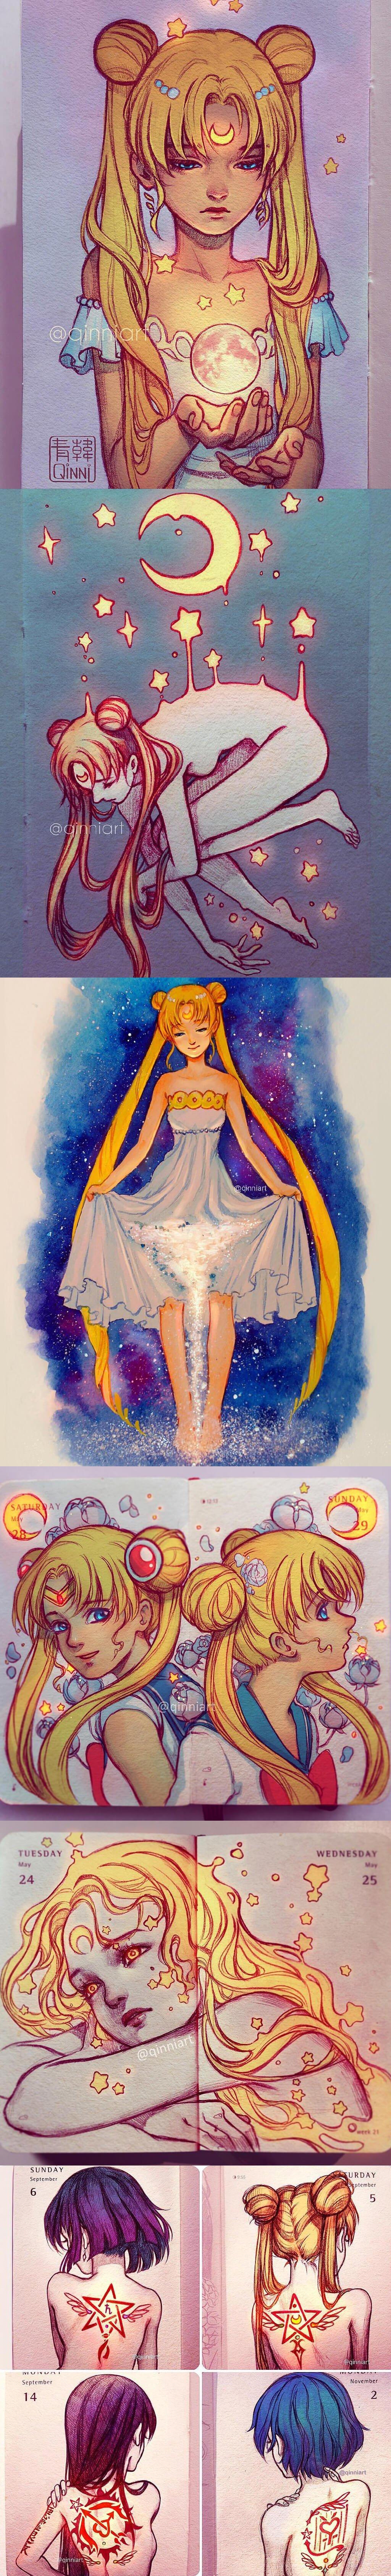 Sailor Moon Art by Qing Han